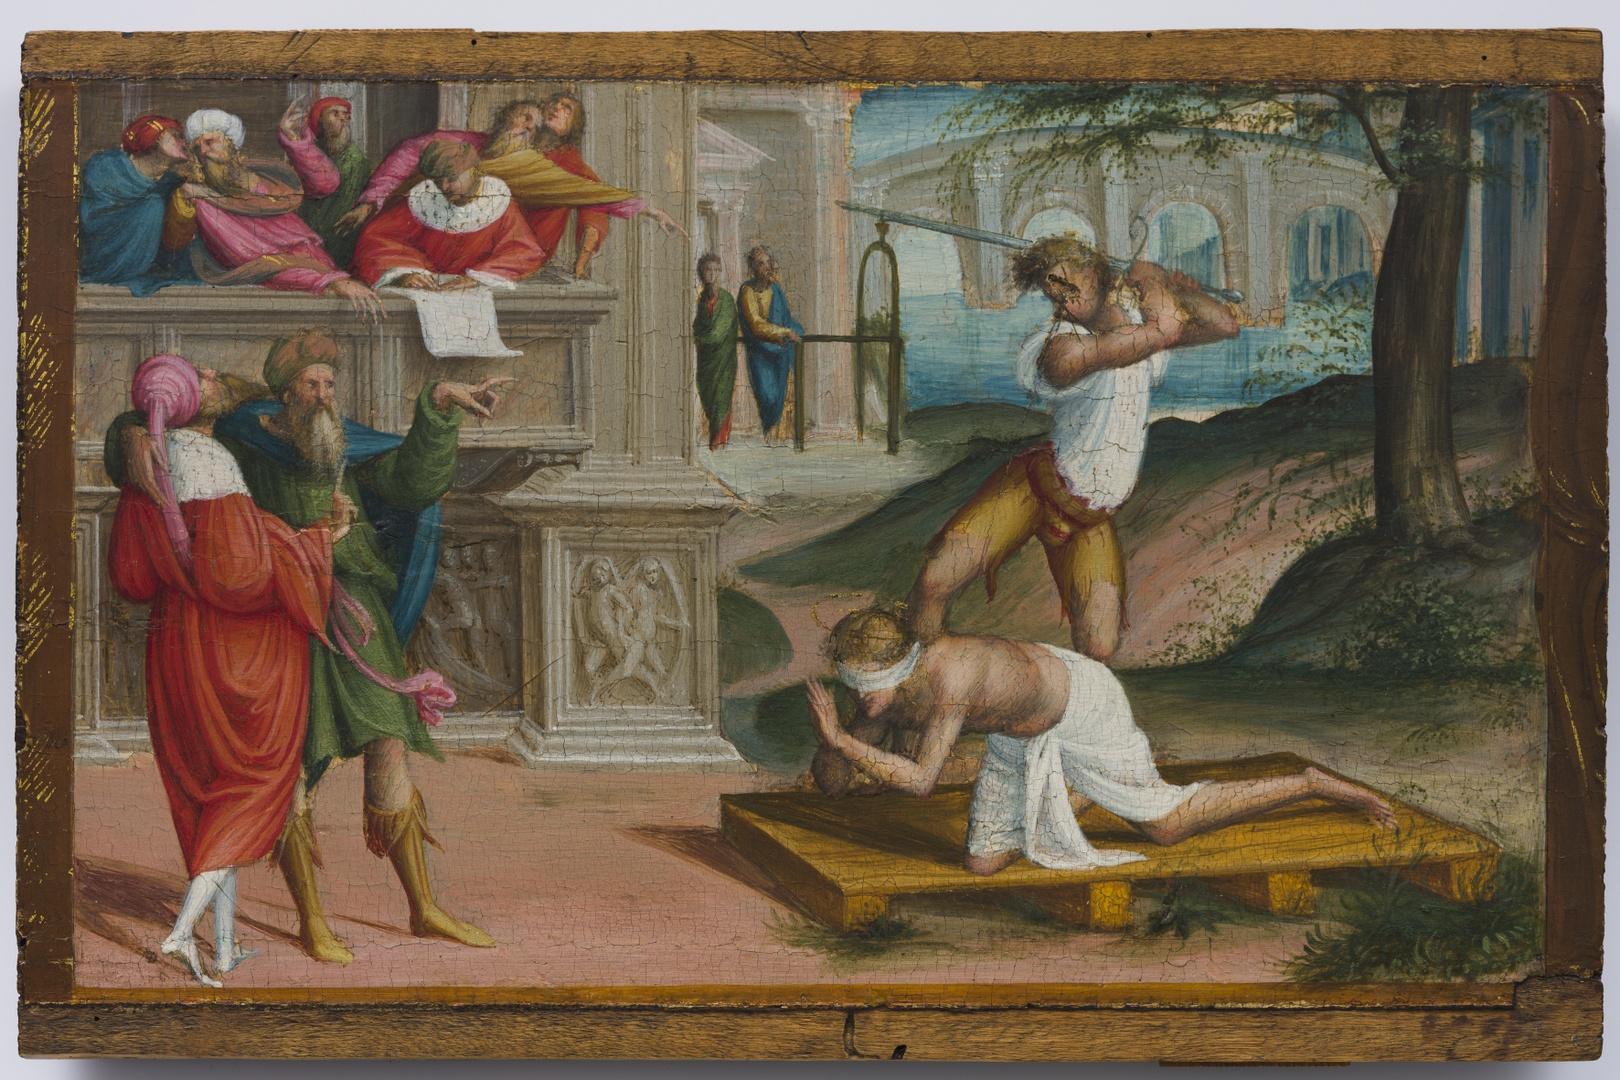 Beheading of a Saint